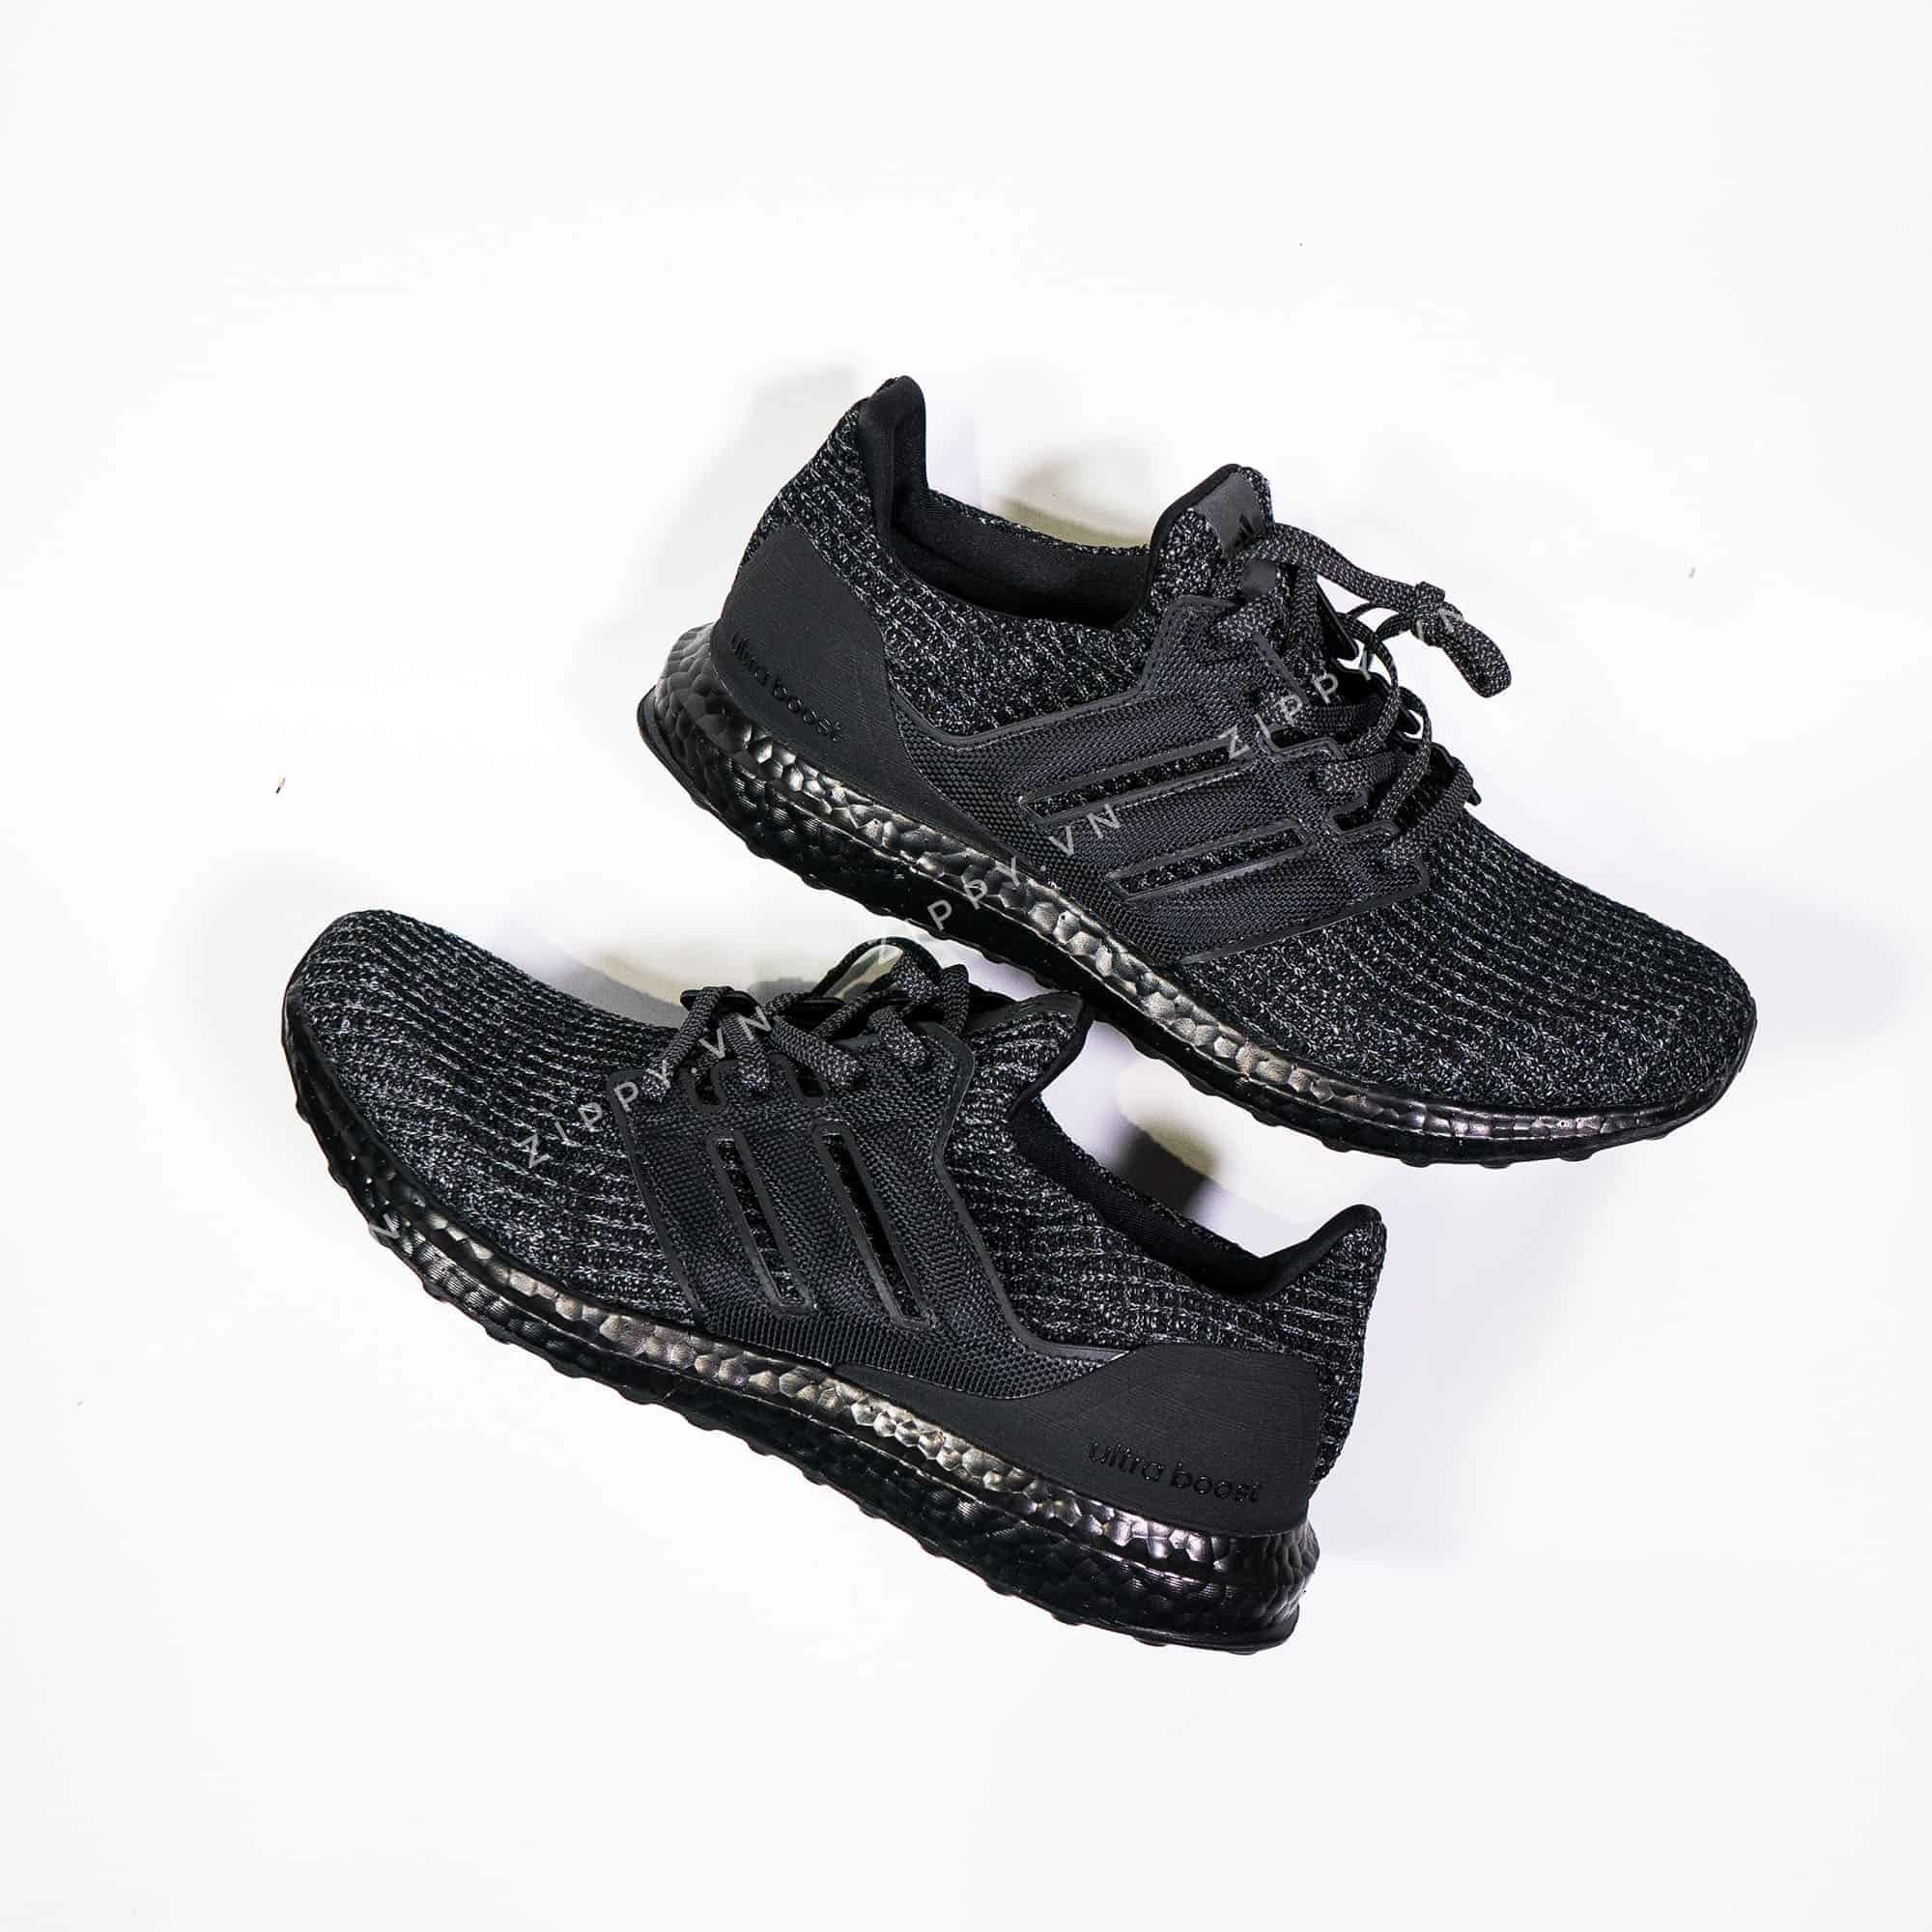 7b57410c43a58 Adidas Ultra Boost 4.0 Replica 1 1 Triple Black – Zippy Giày Replica ...